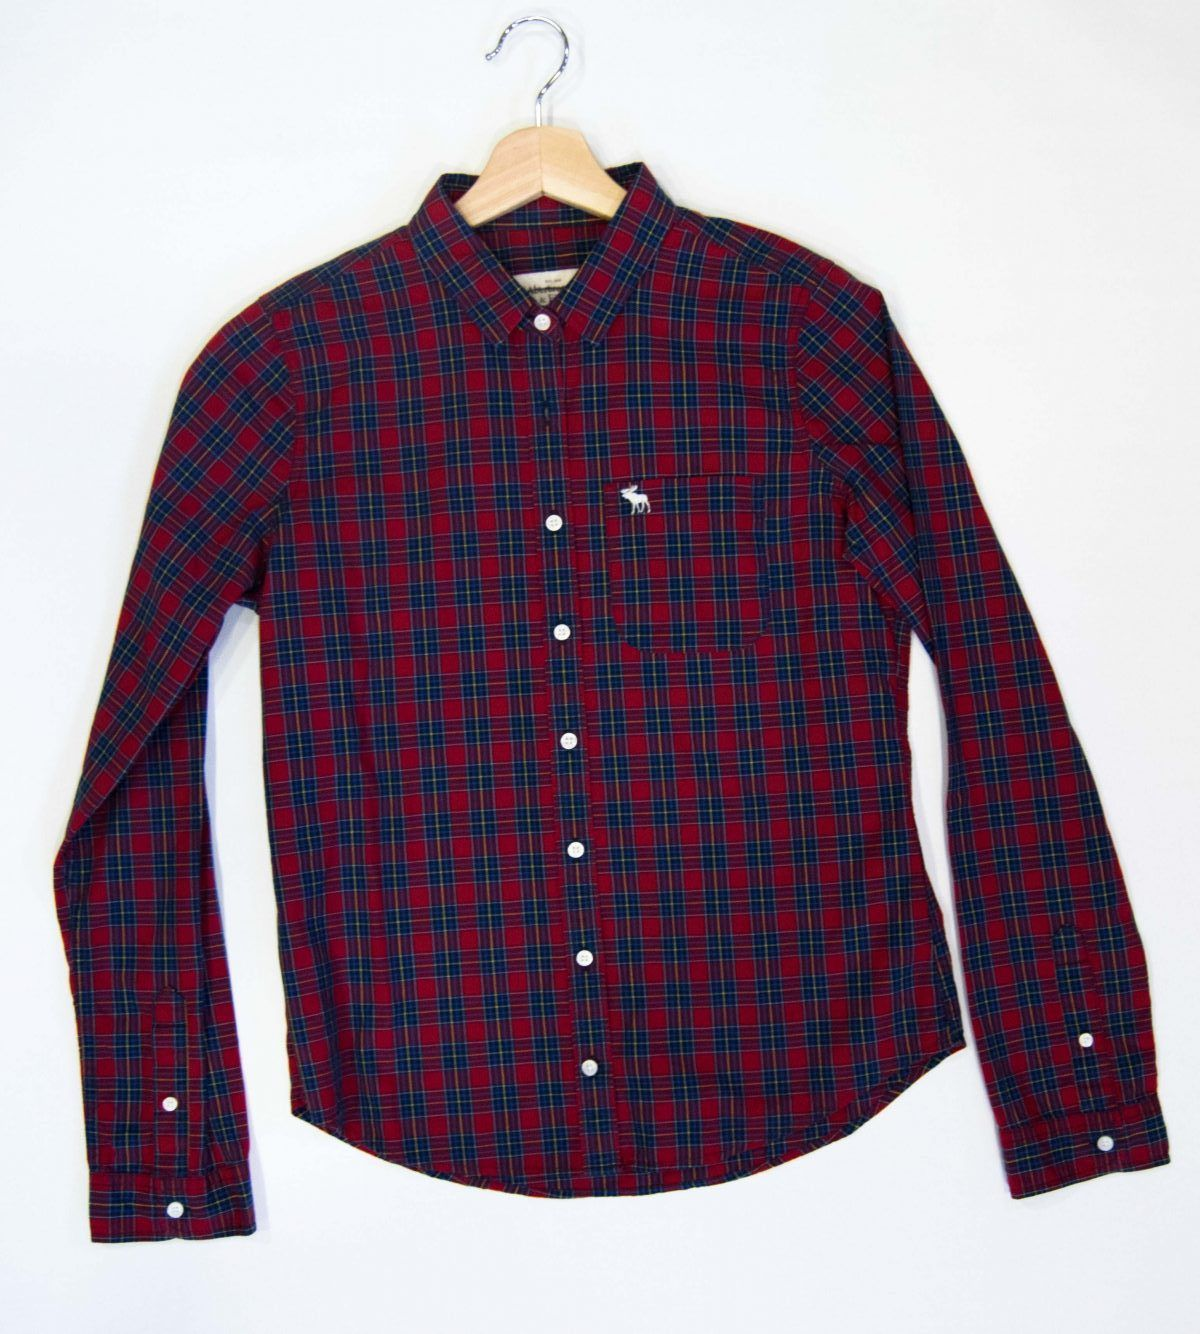 Abercrombie | Camisas, Ropa y Mangas largas